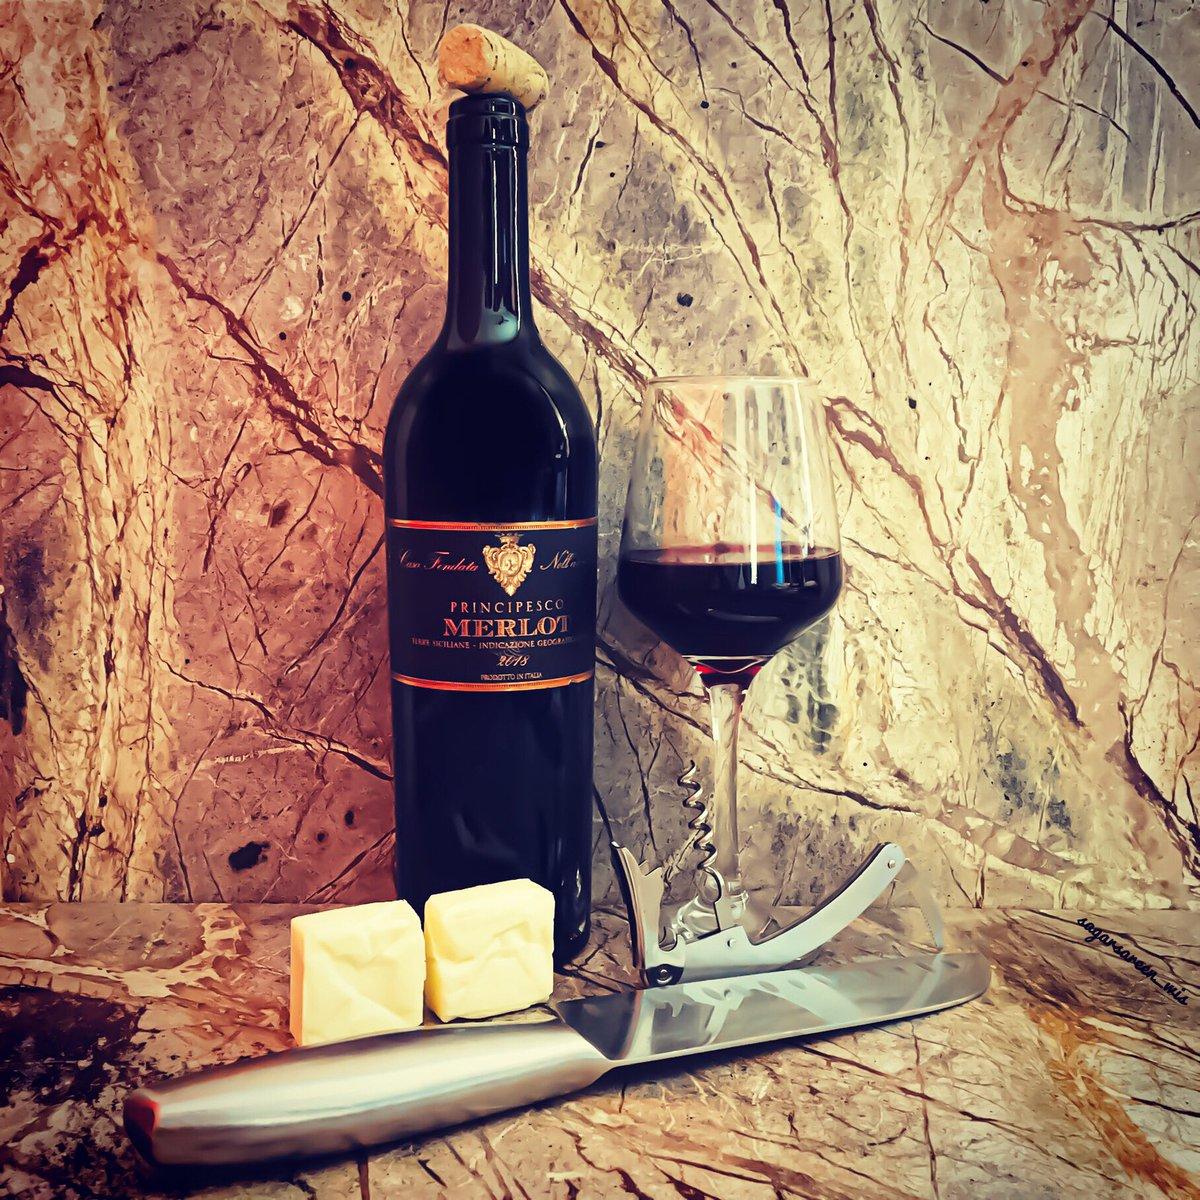 Thursday wine🍷&cheese🧀. 2018 Castellani Principesco Merlot Terre Sicilia IGT, Italy🇮🇹  #sagarsareen #vino #castellaniwine #wine   https://t.co/nDb49fLqv1 https://t.co/ZdCyuav3Oi